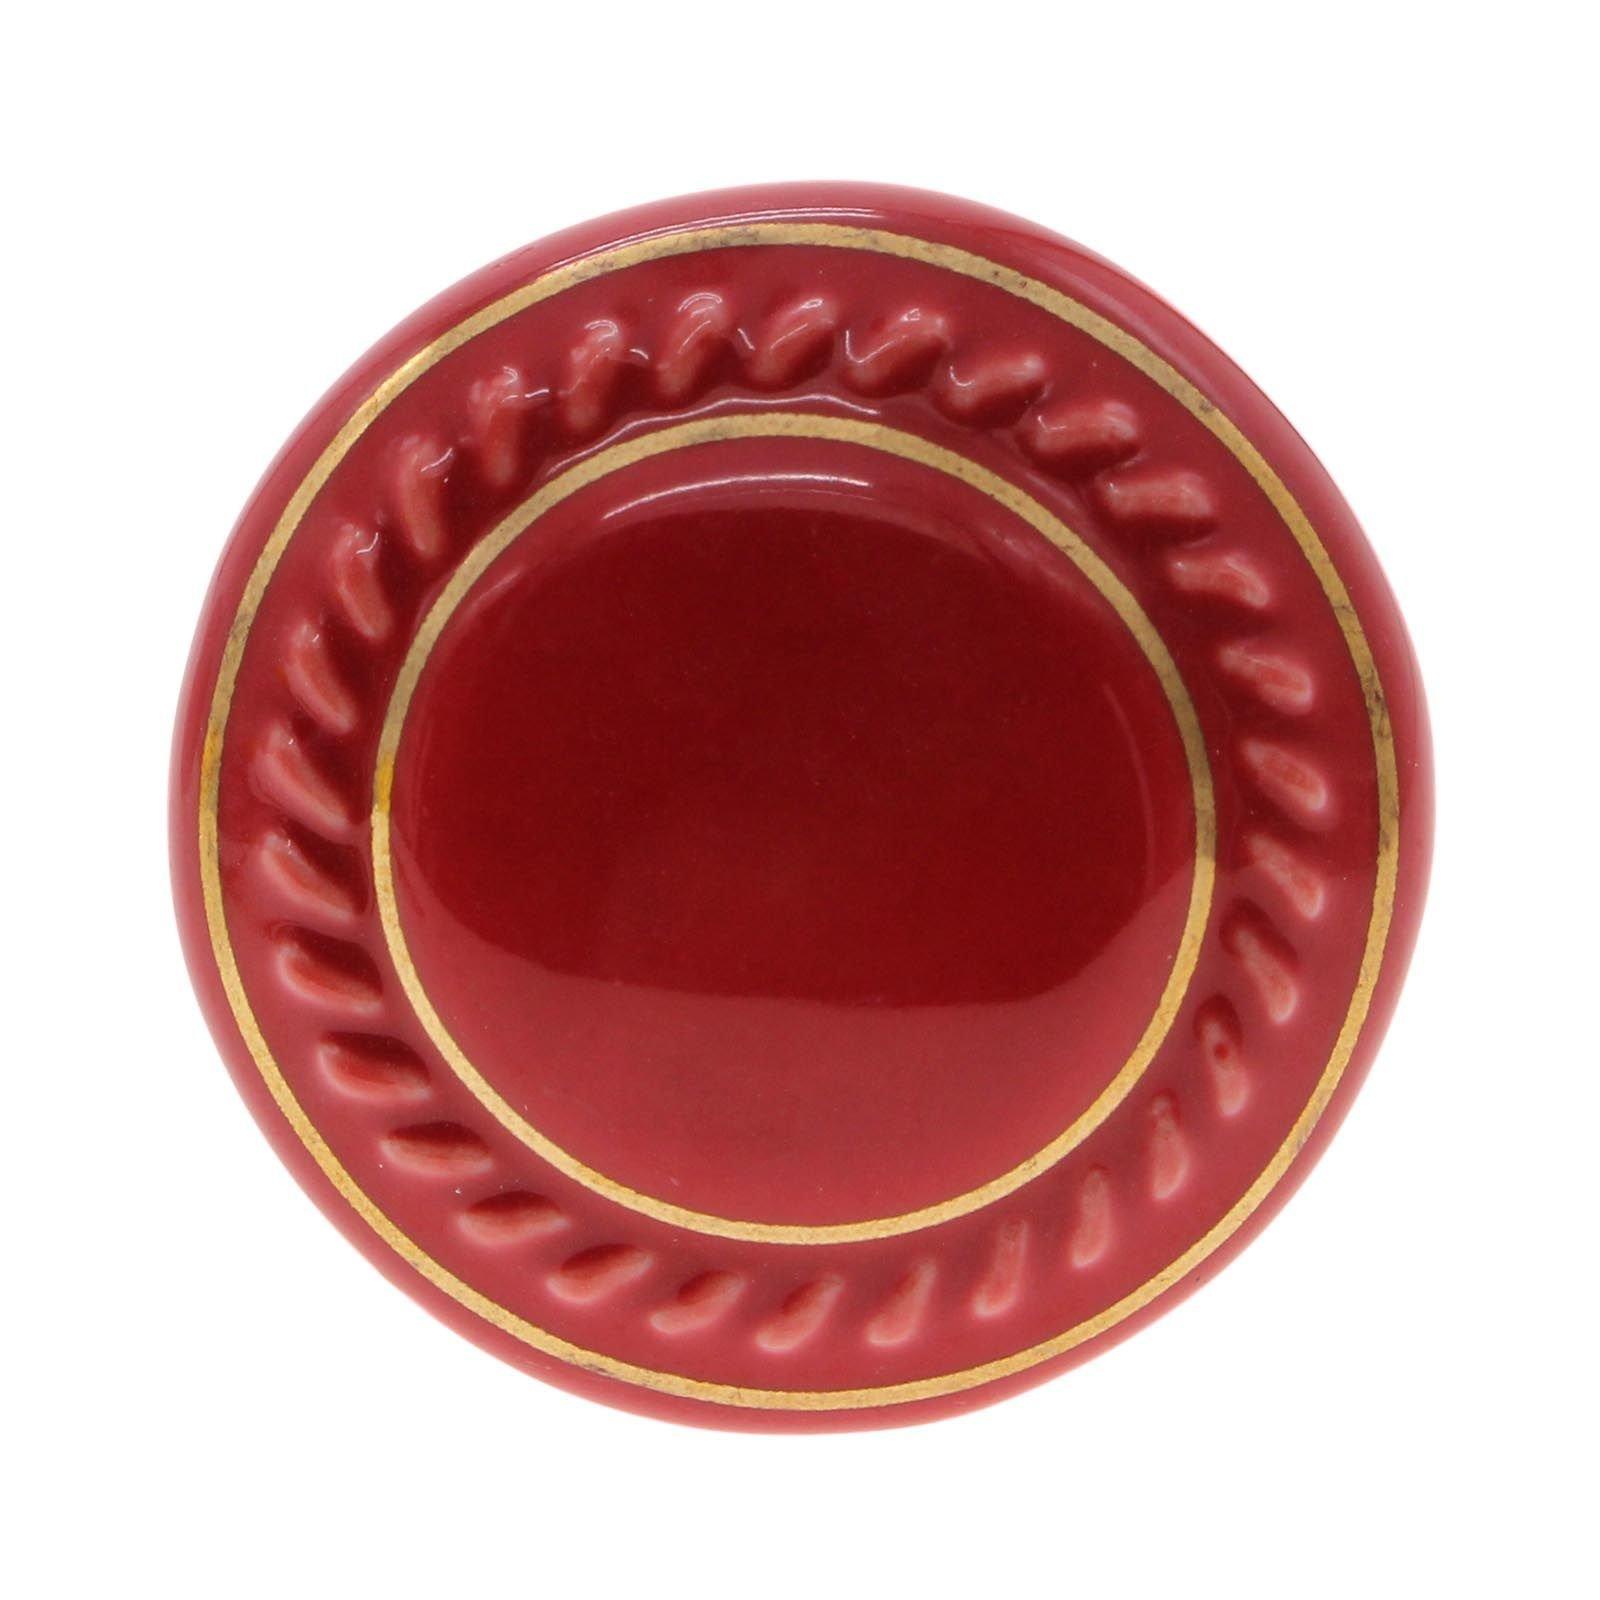 VANKER 1Pc Red Ceramic Round Cupboard Wardrobe Door Drawer Knob Pull Handle